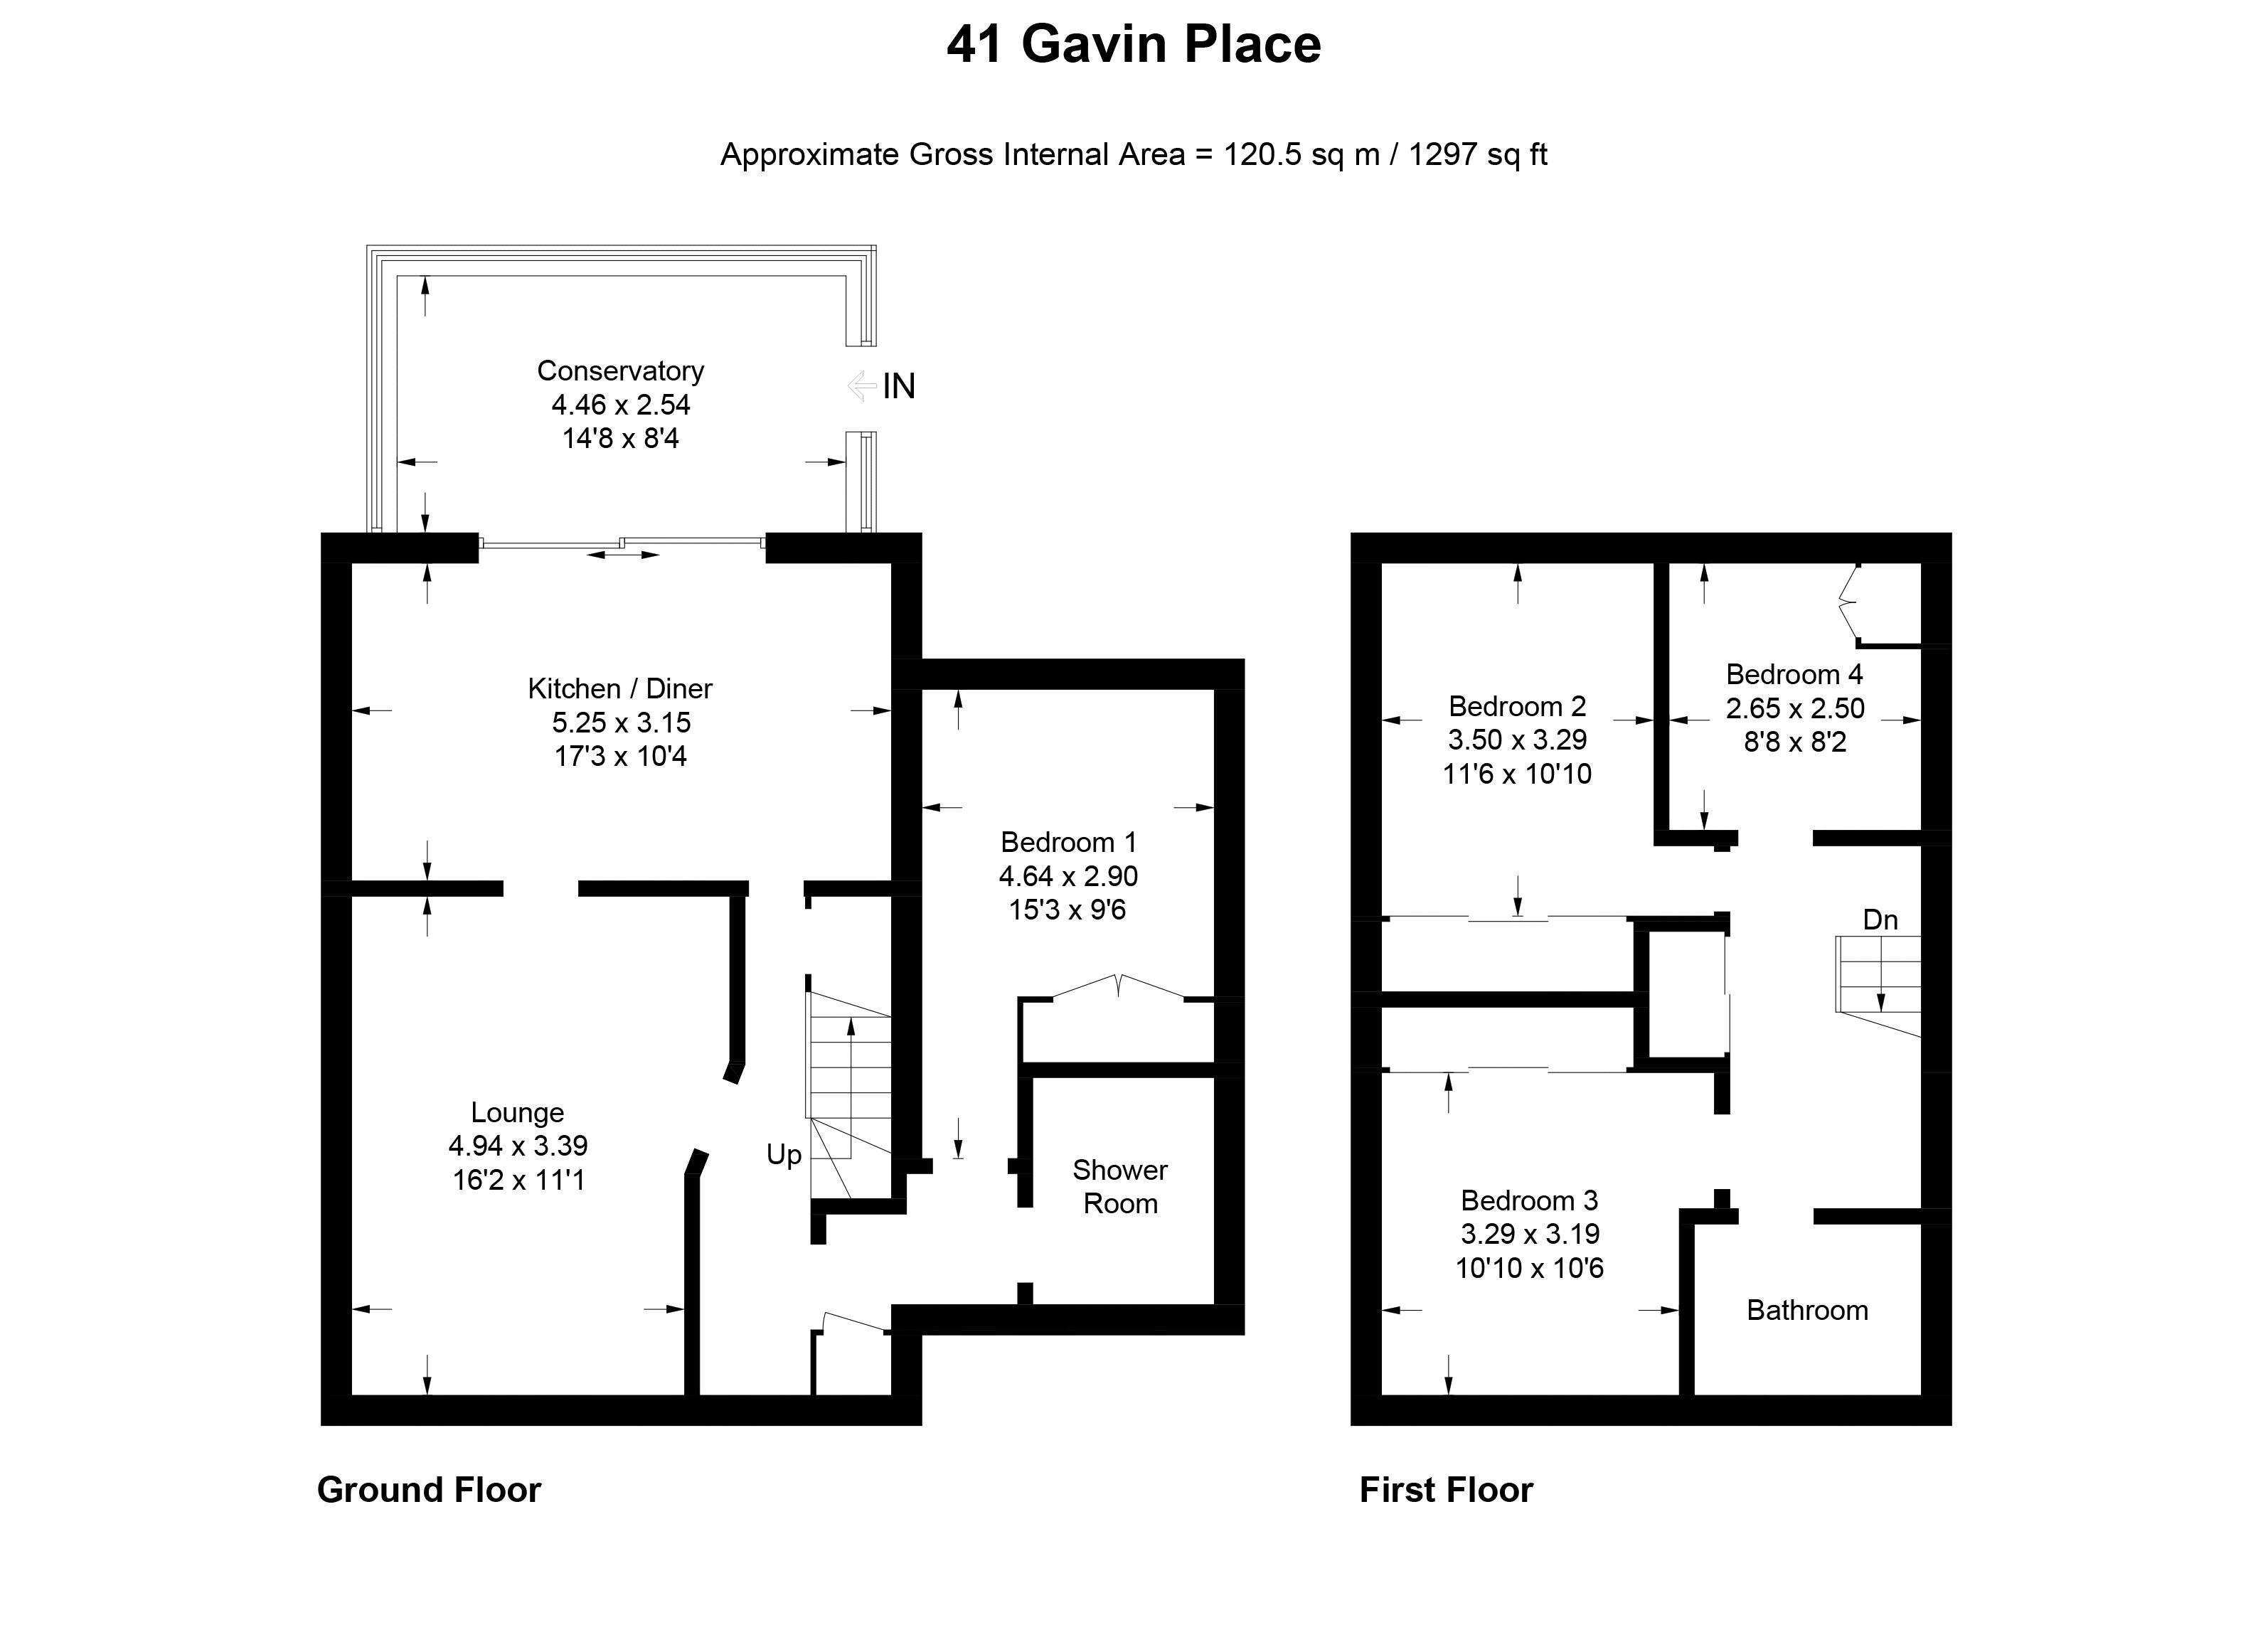 Gavin Place